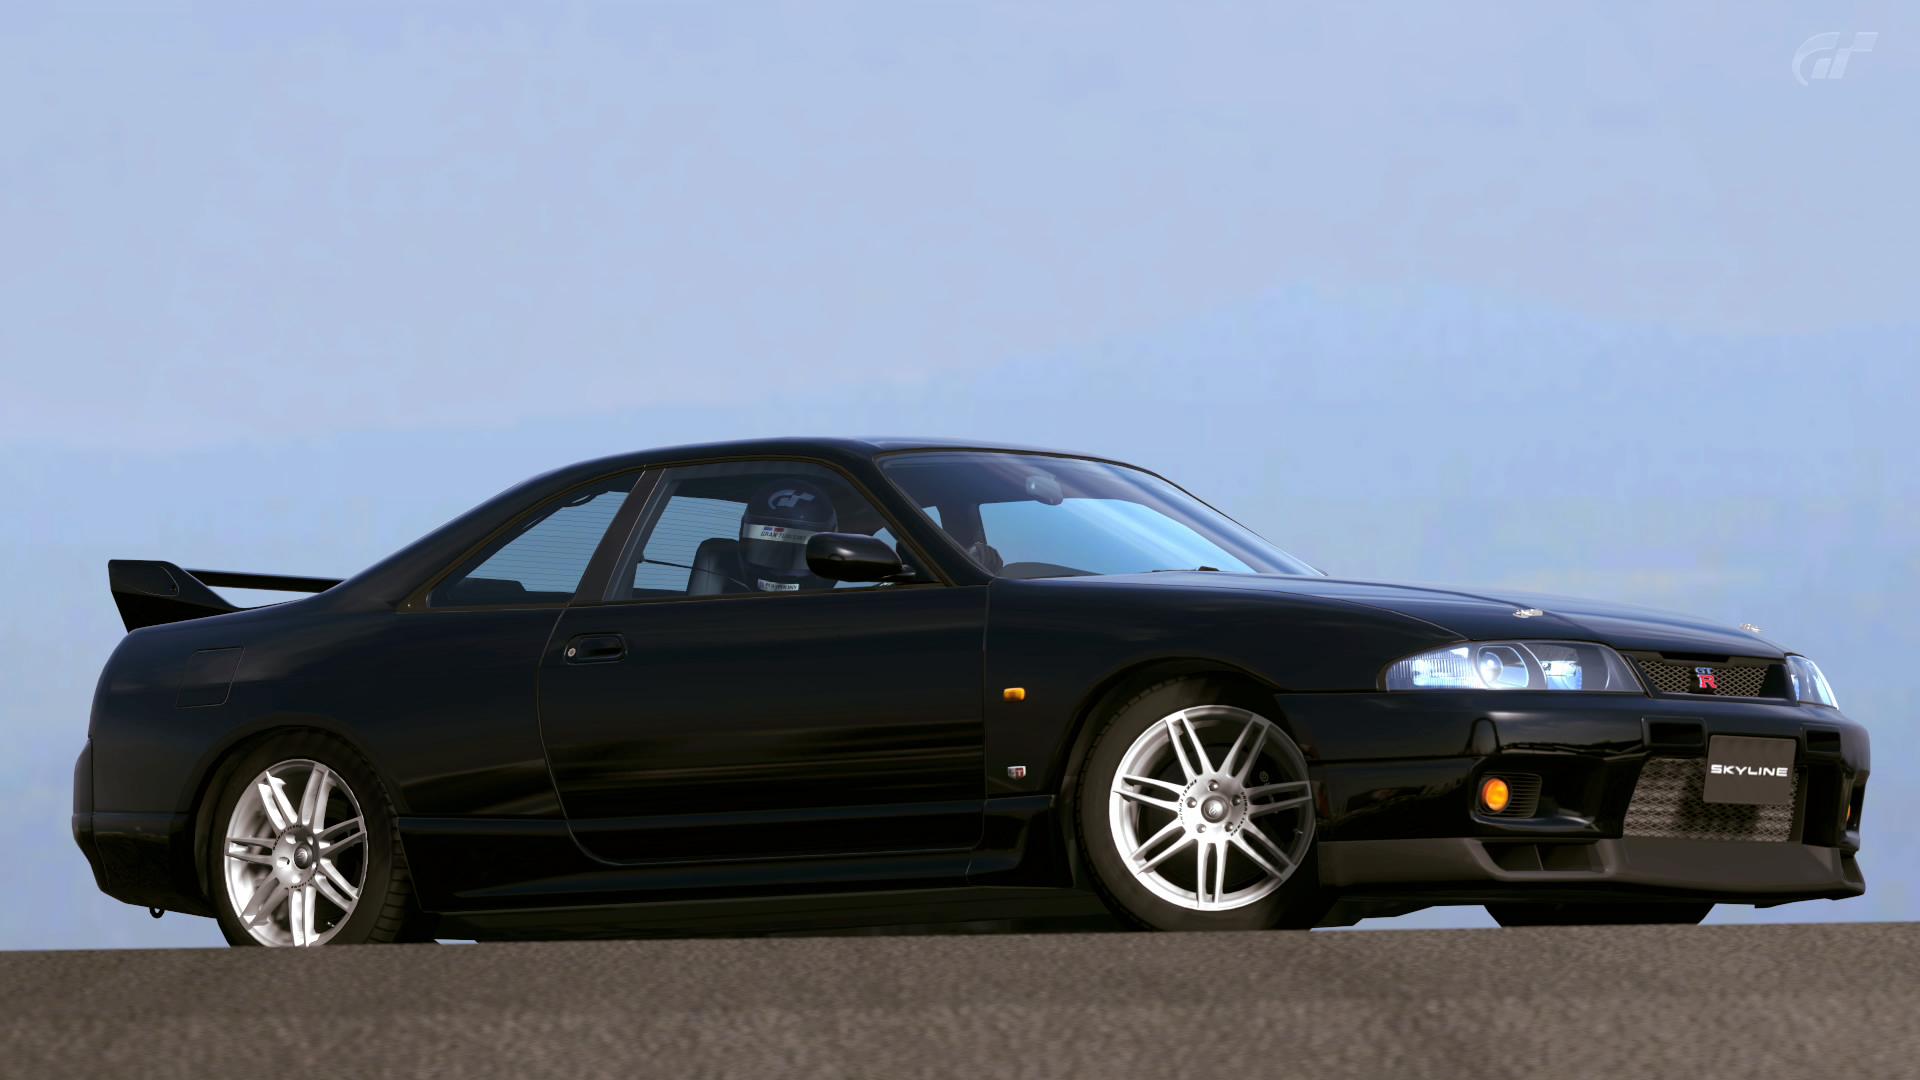 1997 Nissan Skyline GTR R33 VSpec GT5 by Vertualissimo on